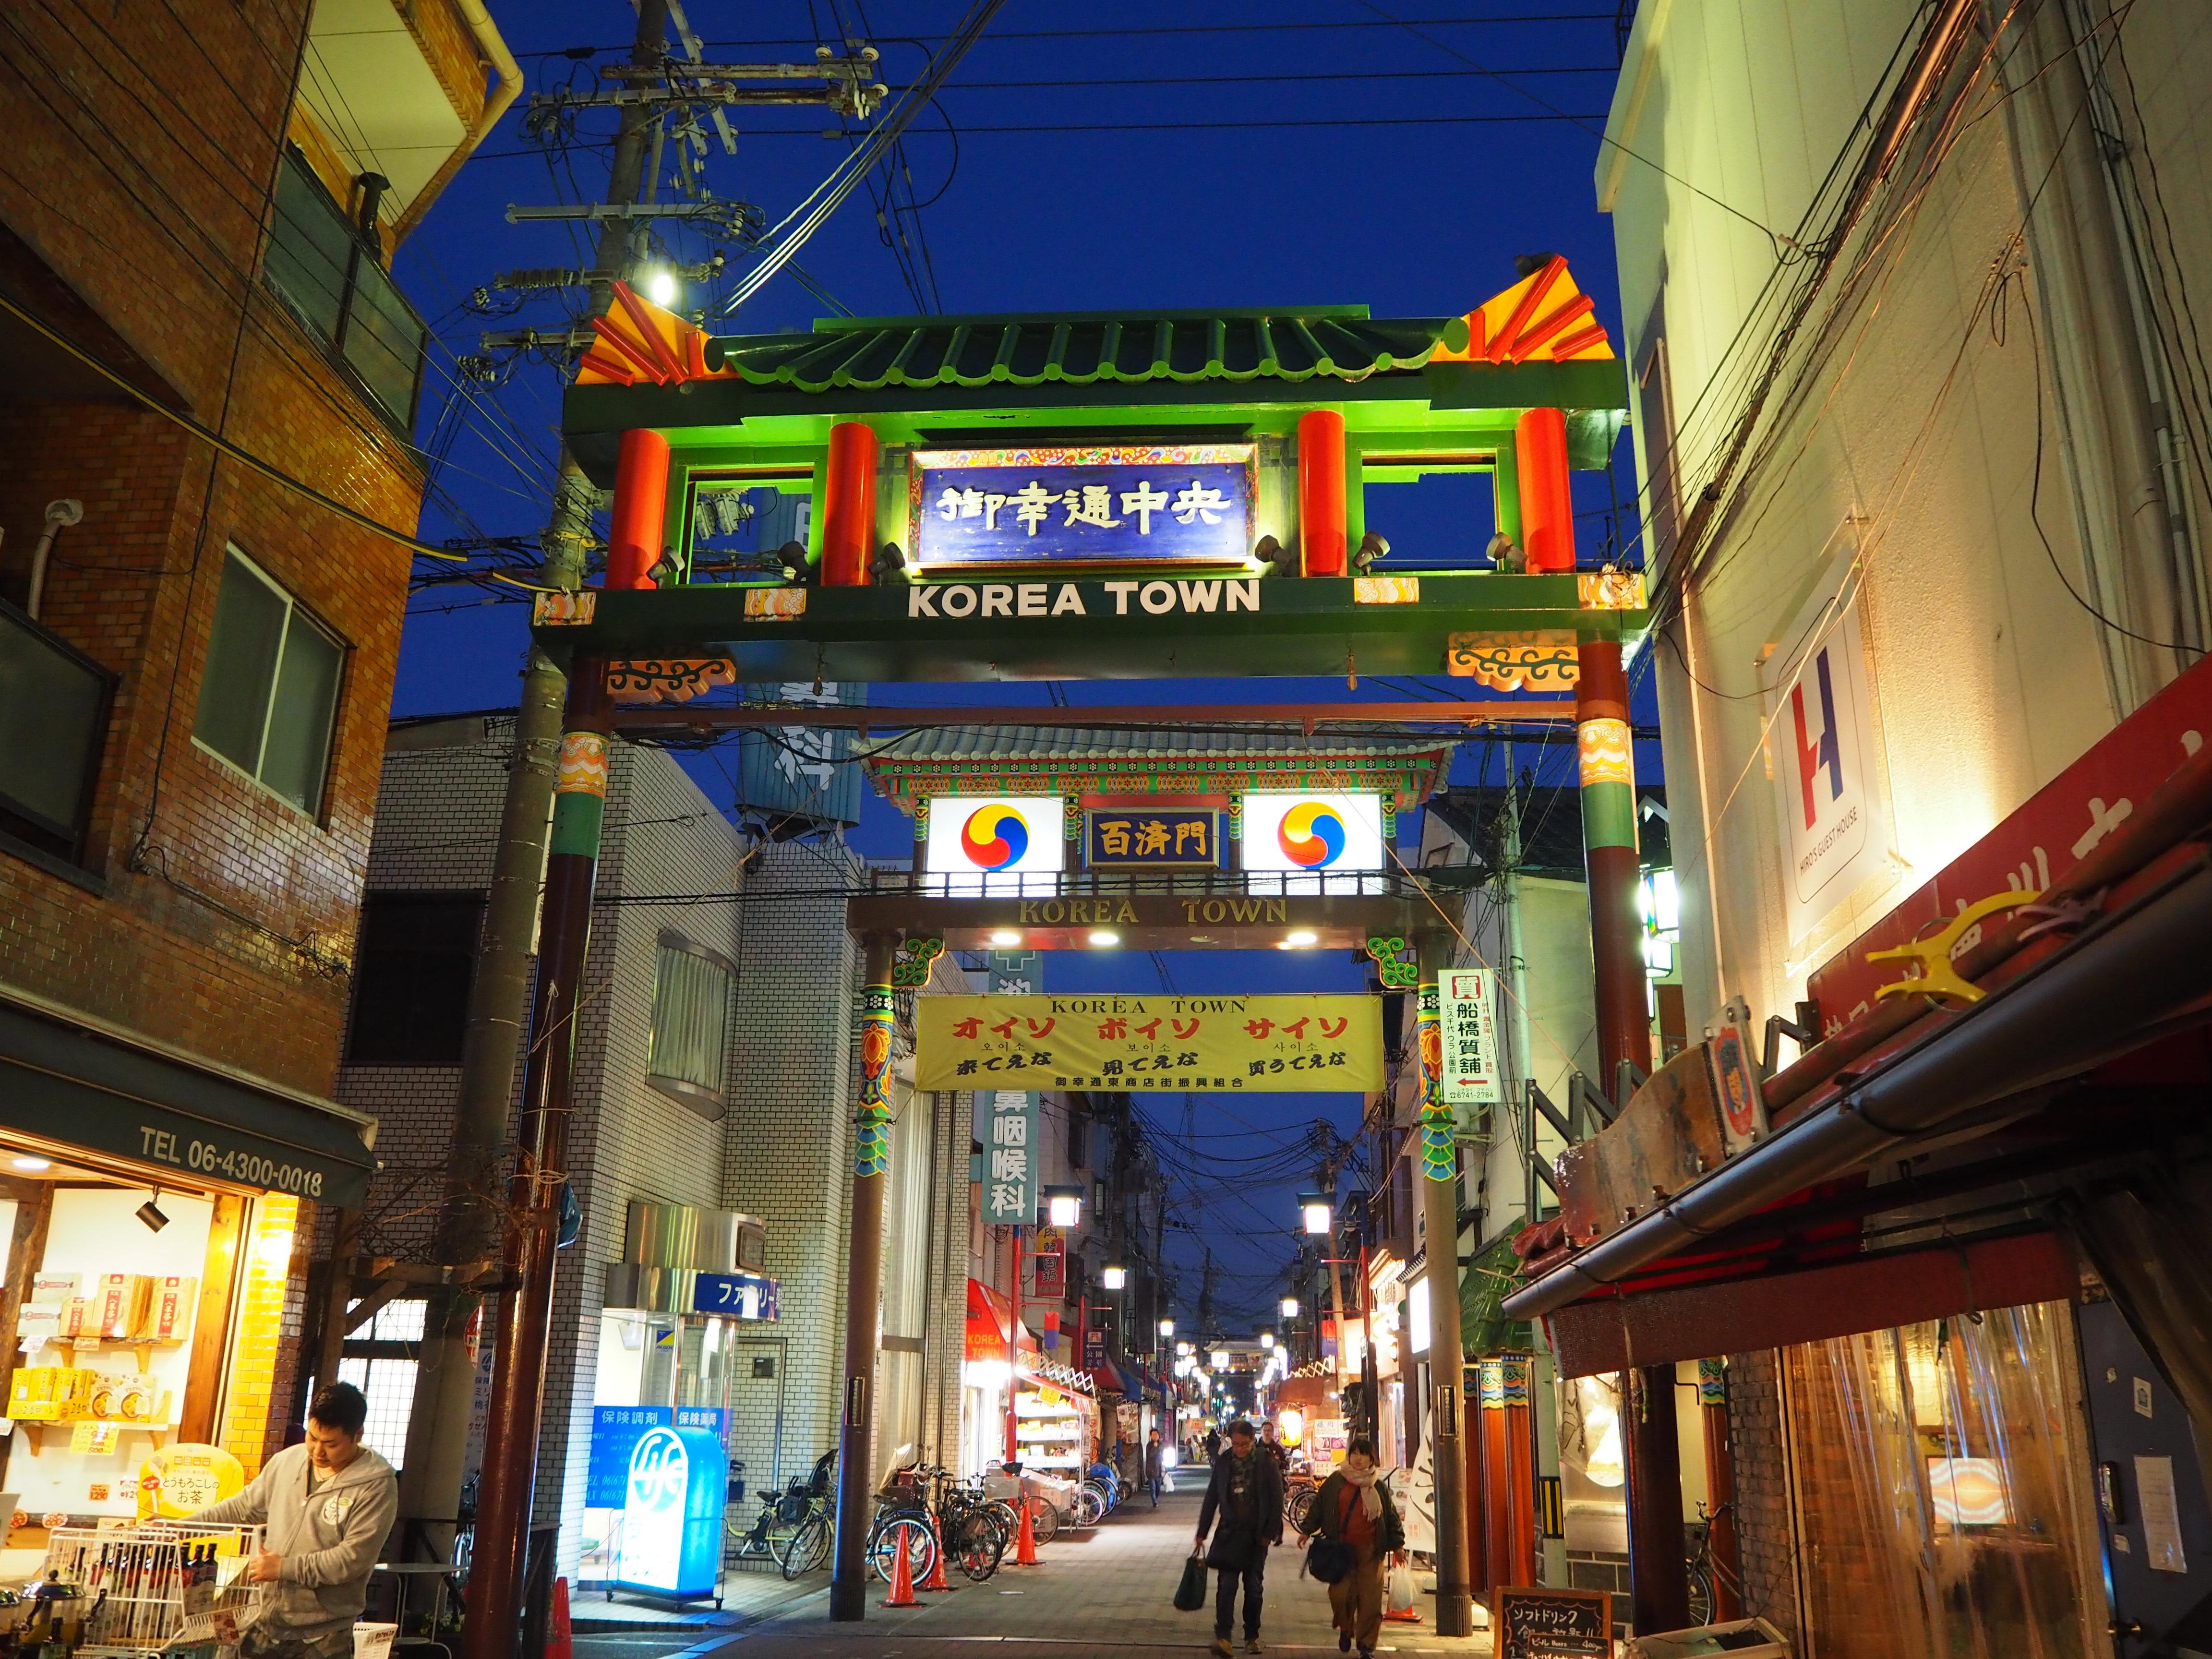 osaka korea town you can enjoy korean culture in osaka city